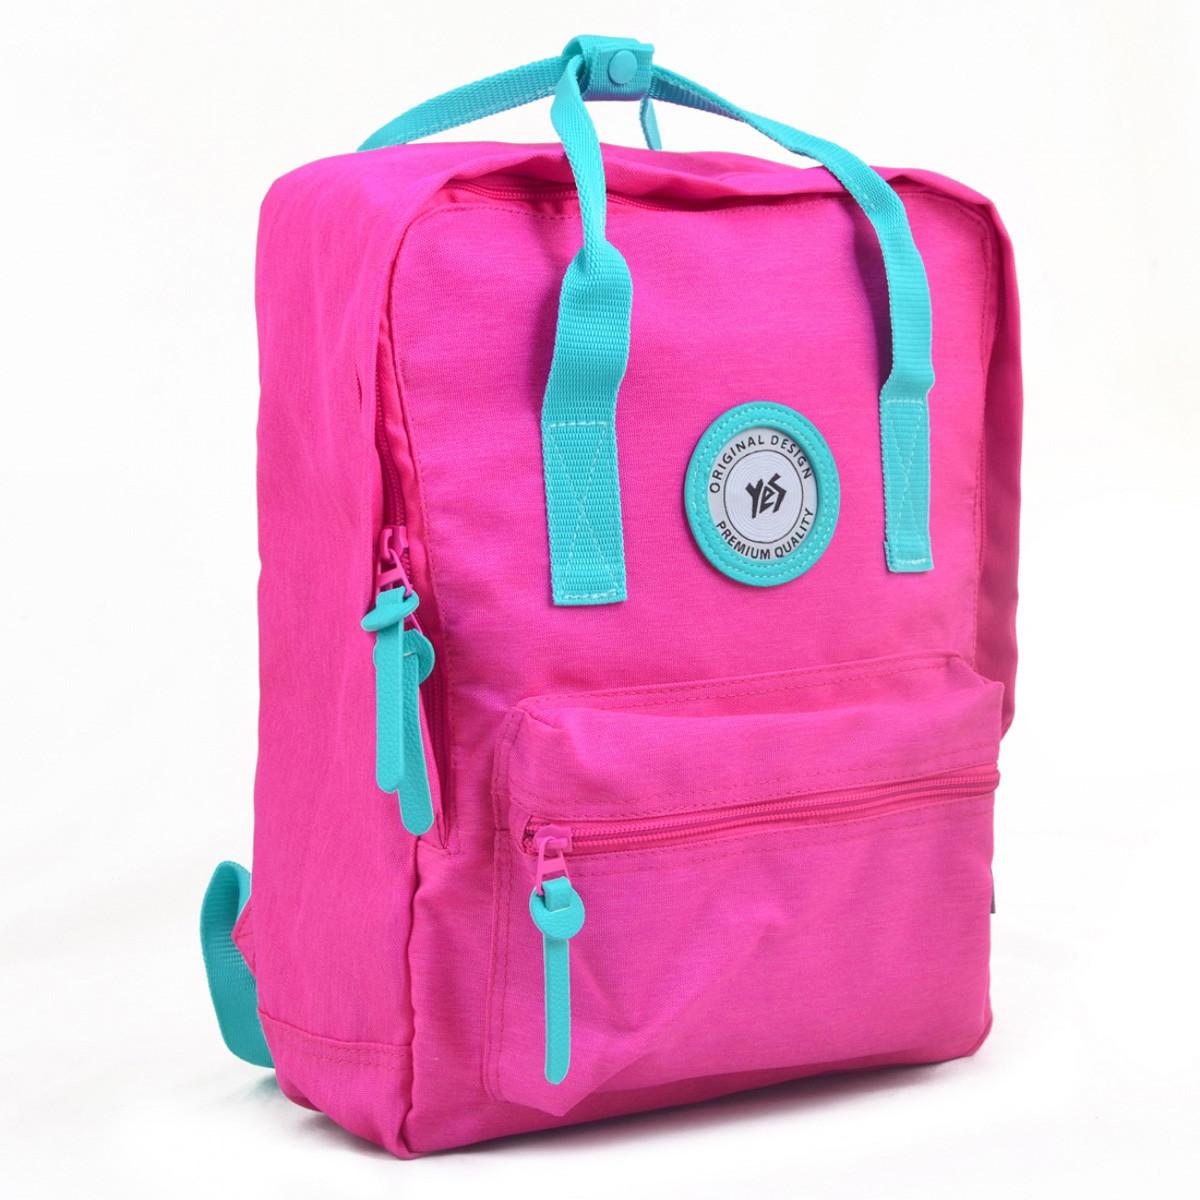 Рюкзак подростковый YES ST-24 Hot pink, 36*25.5*13.5 555587